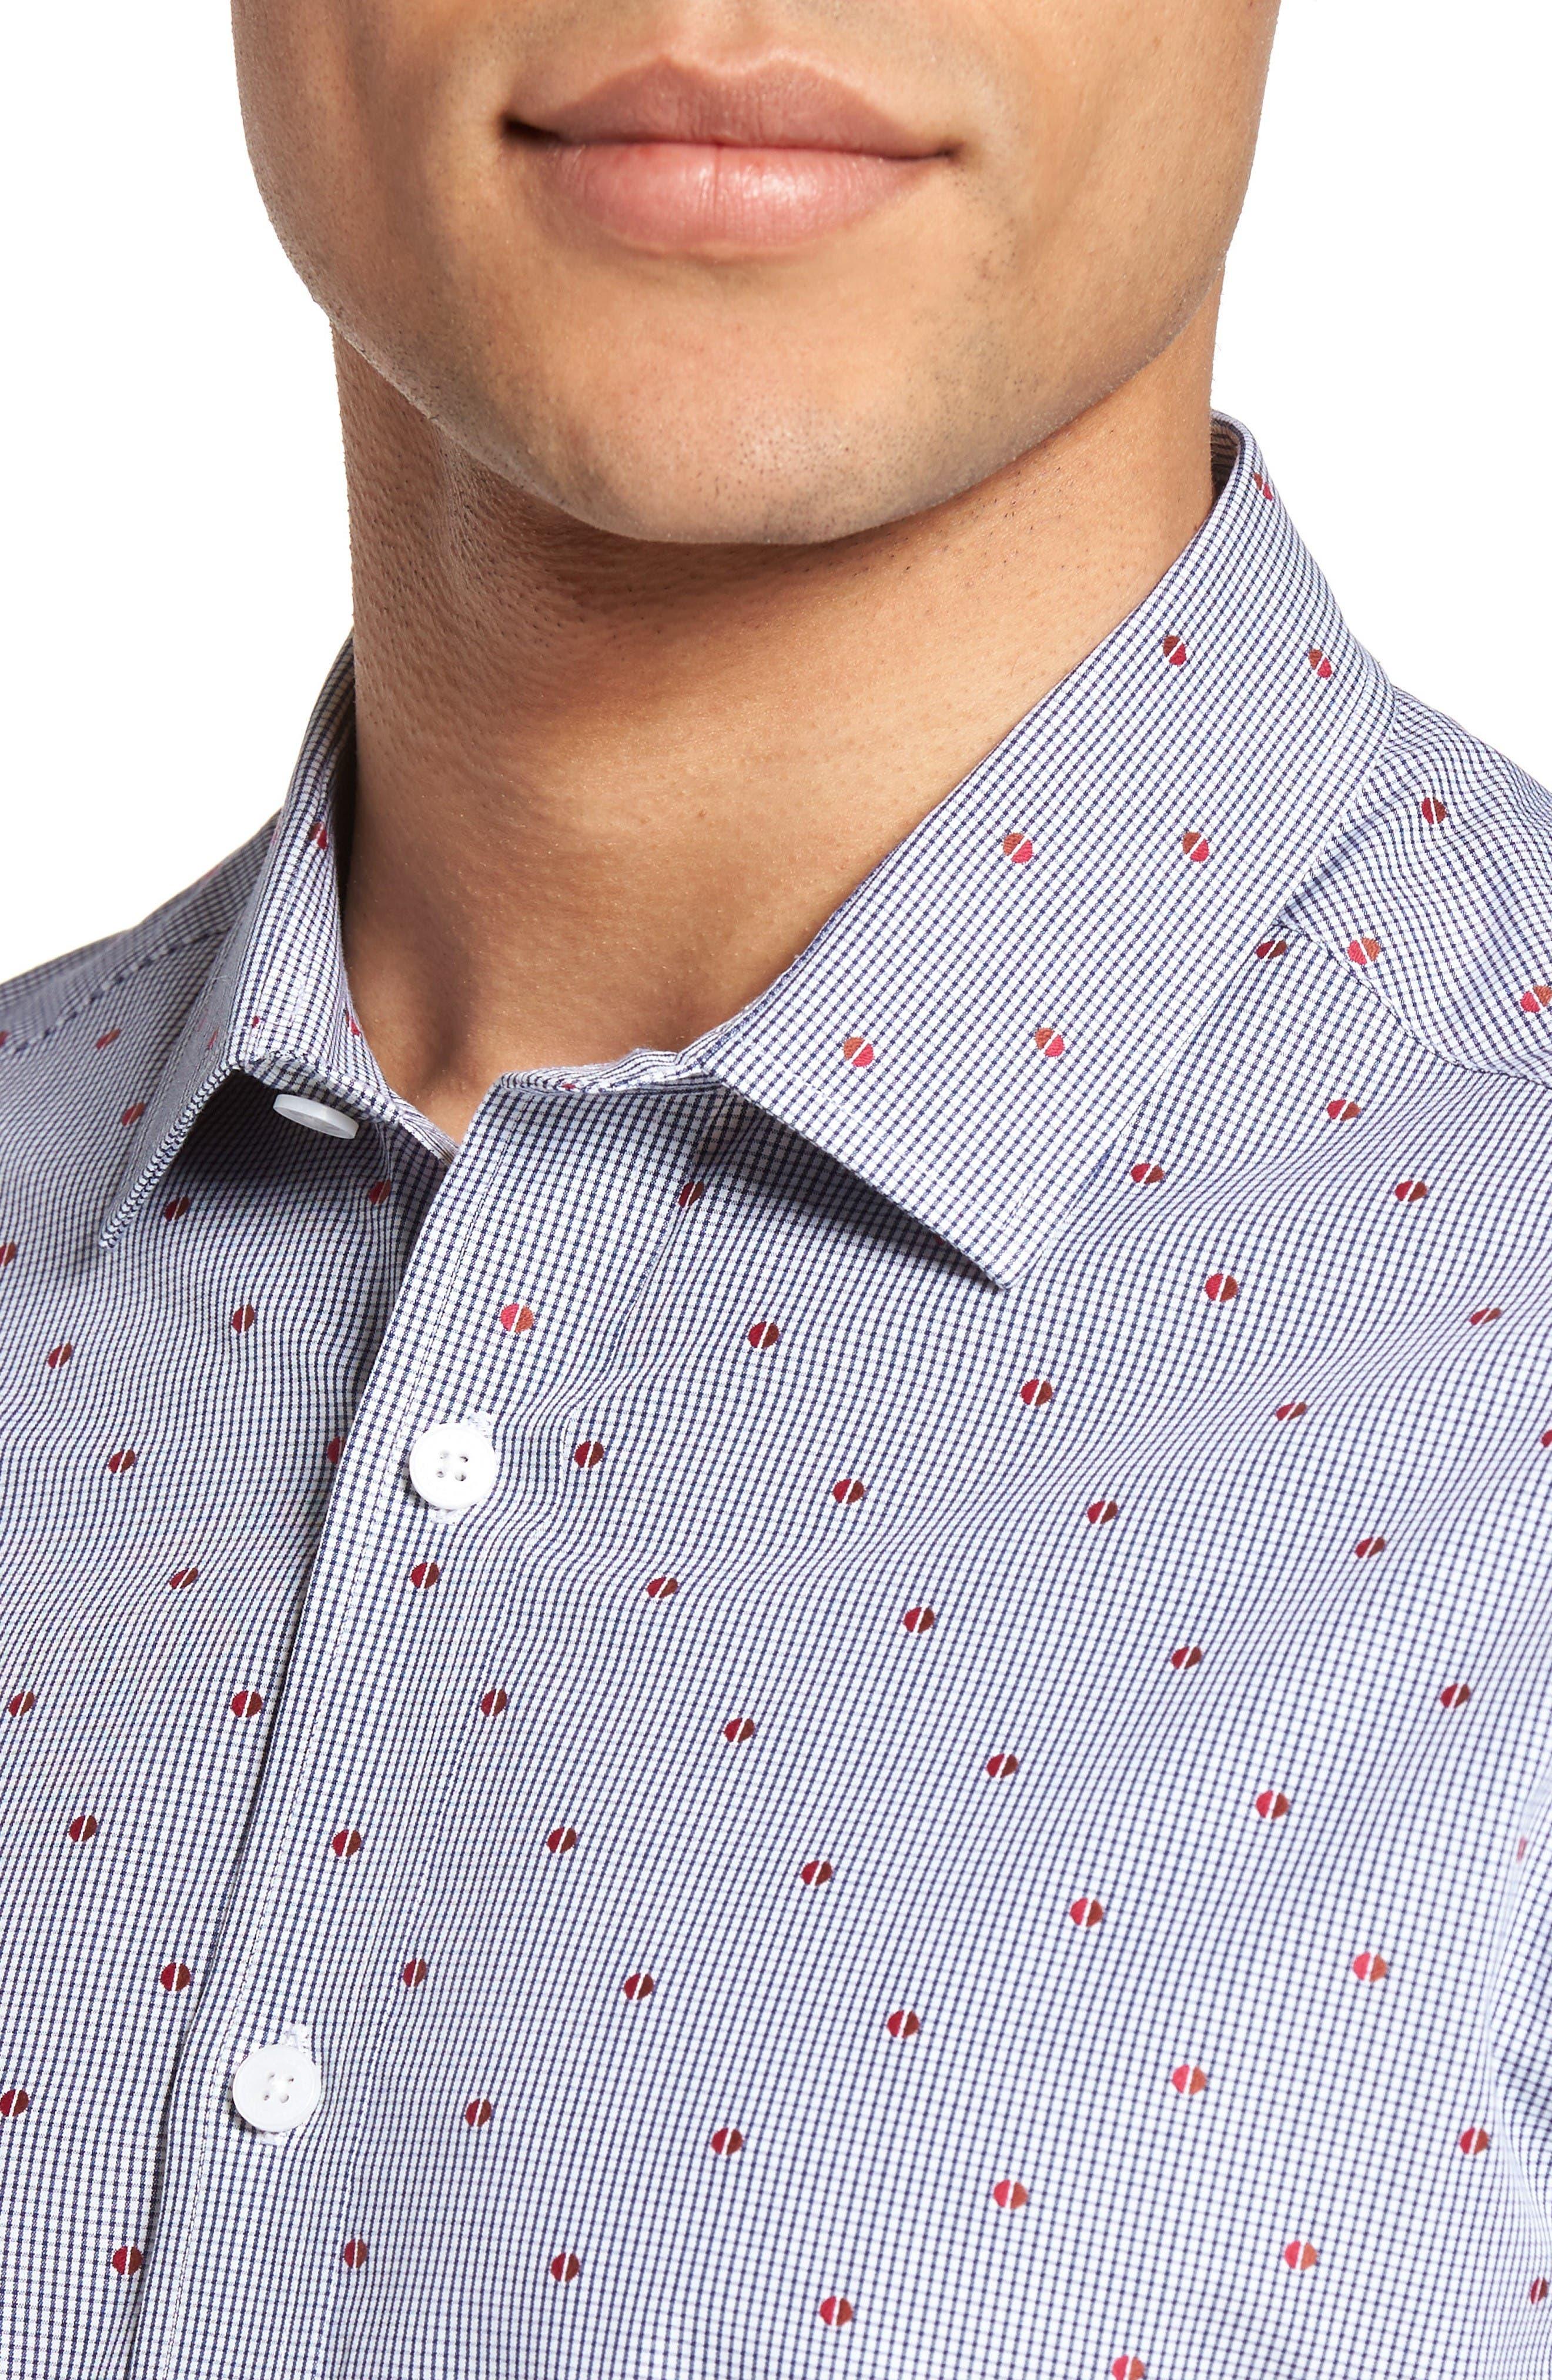 Short Sleeve Sport Shirt,                             Alternate thumbnail 10, color,                             230